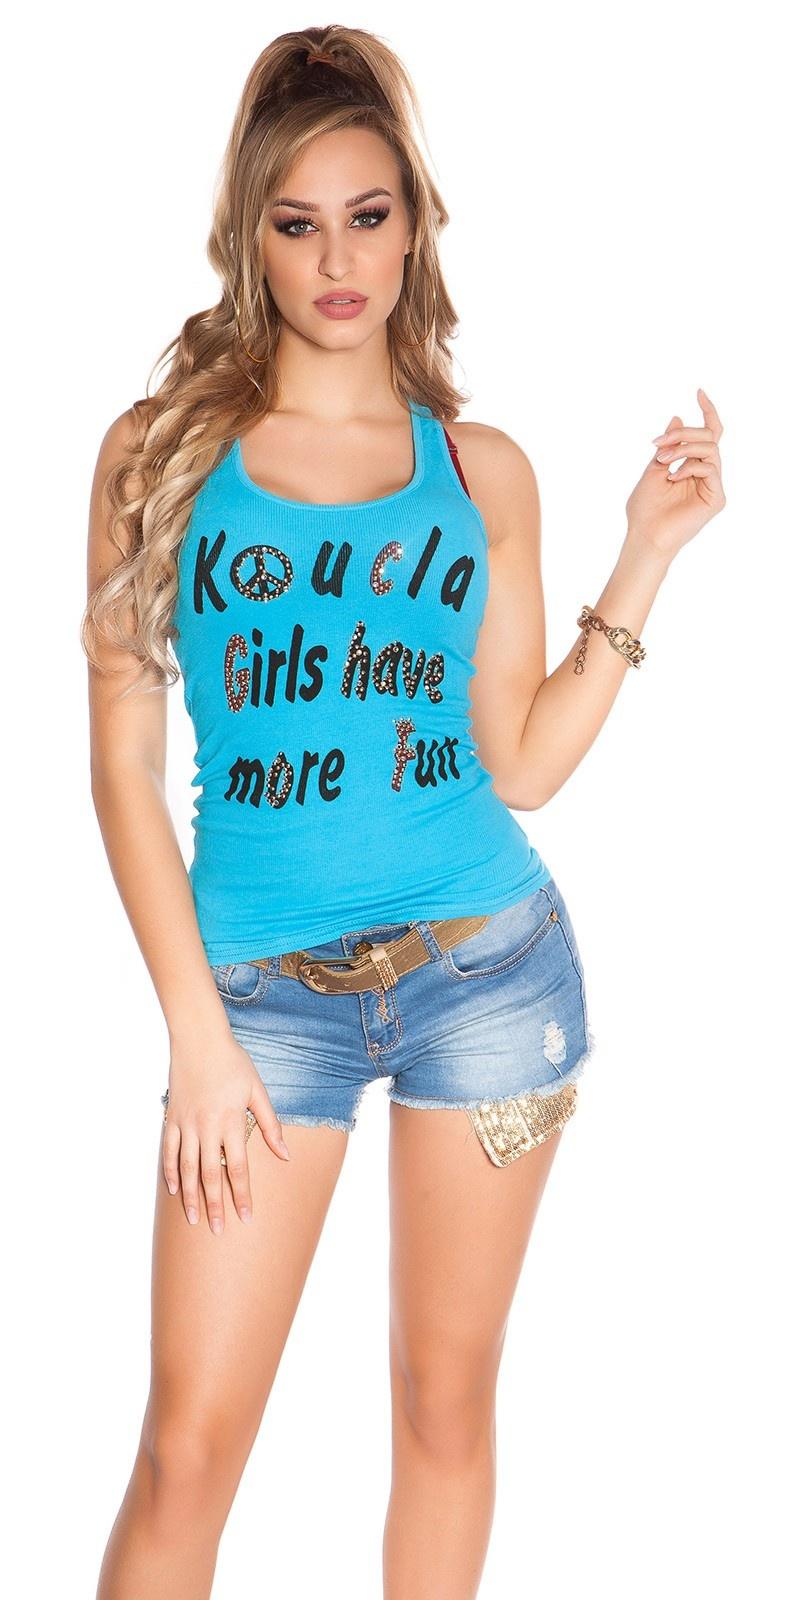 SexyKouCla Girls have more Fun tanktop w. studs Turquoise